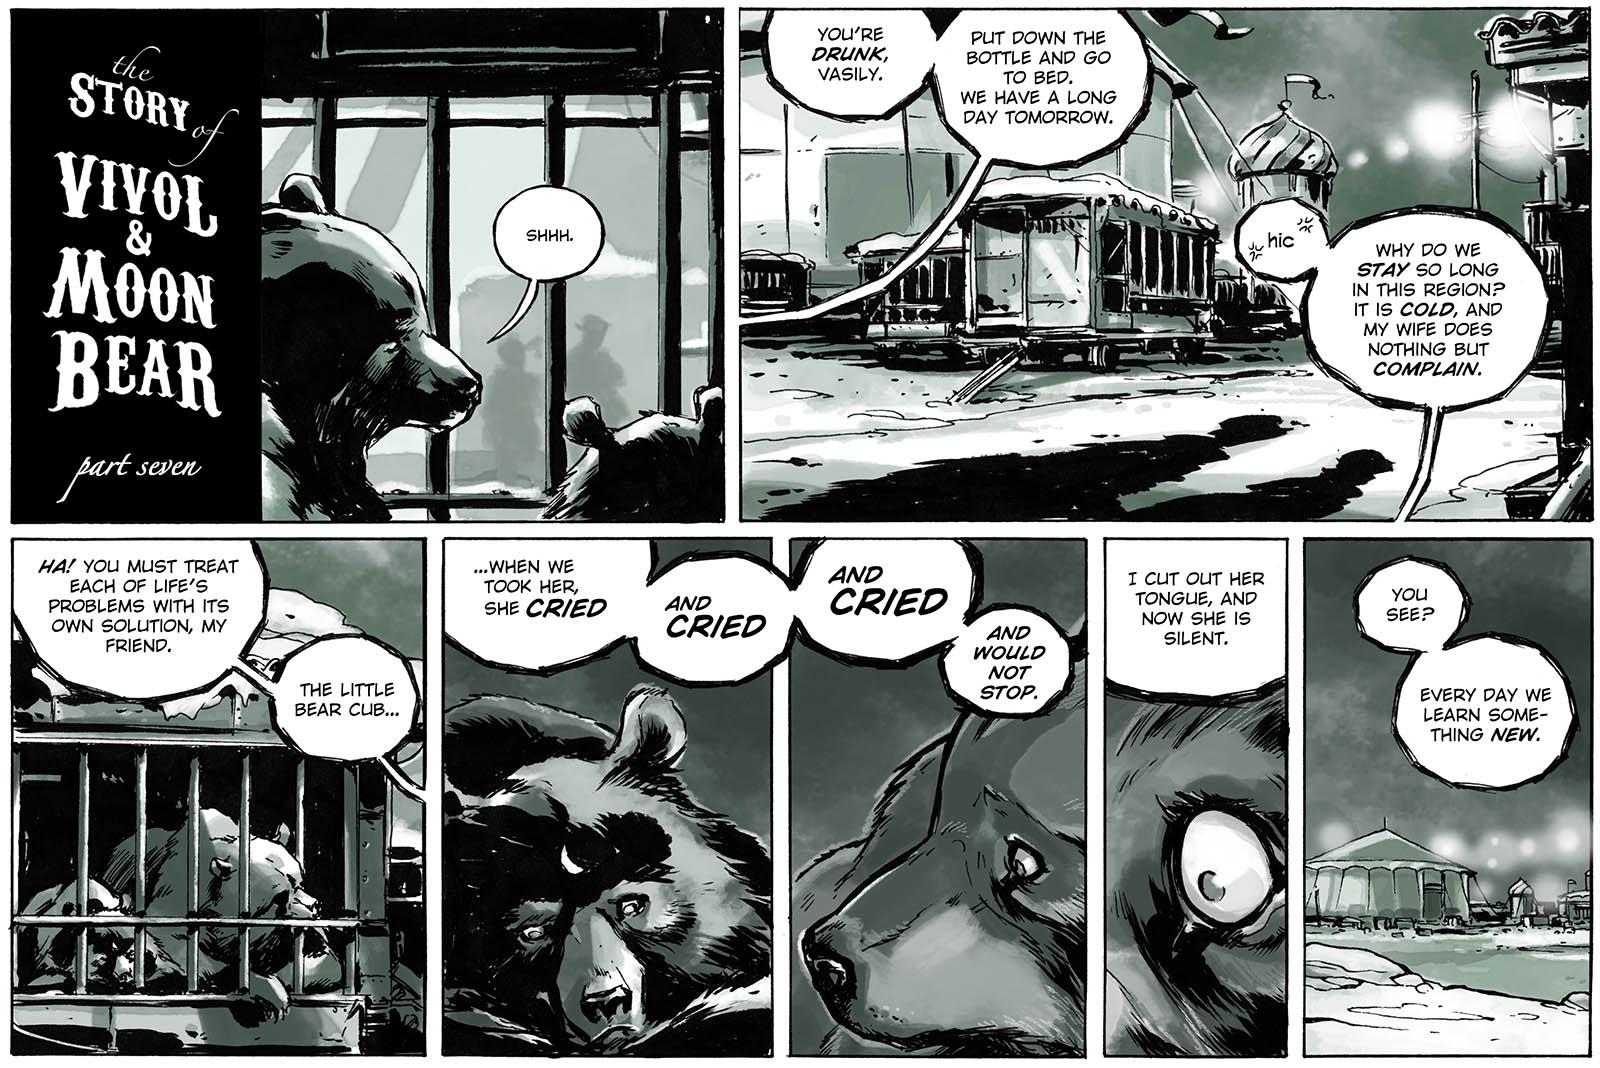 The Story of Vivol & Moon Bear – part seven